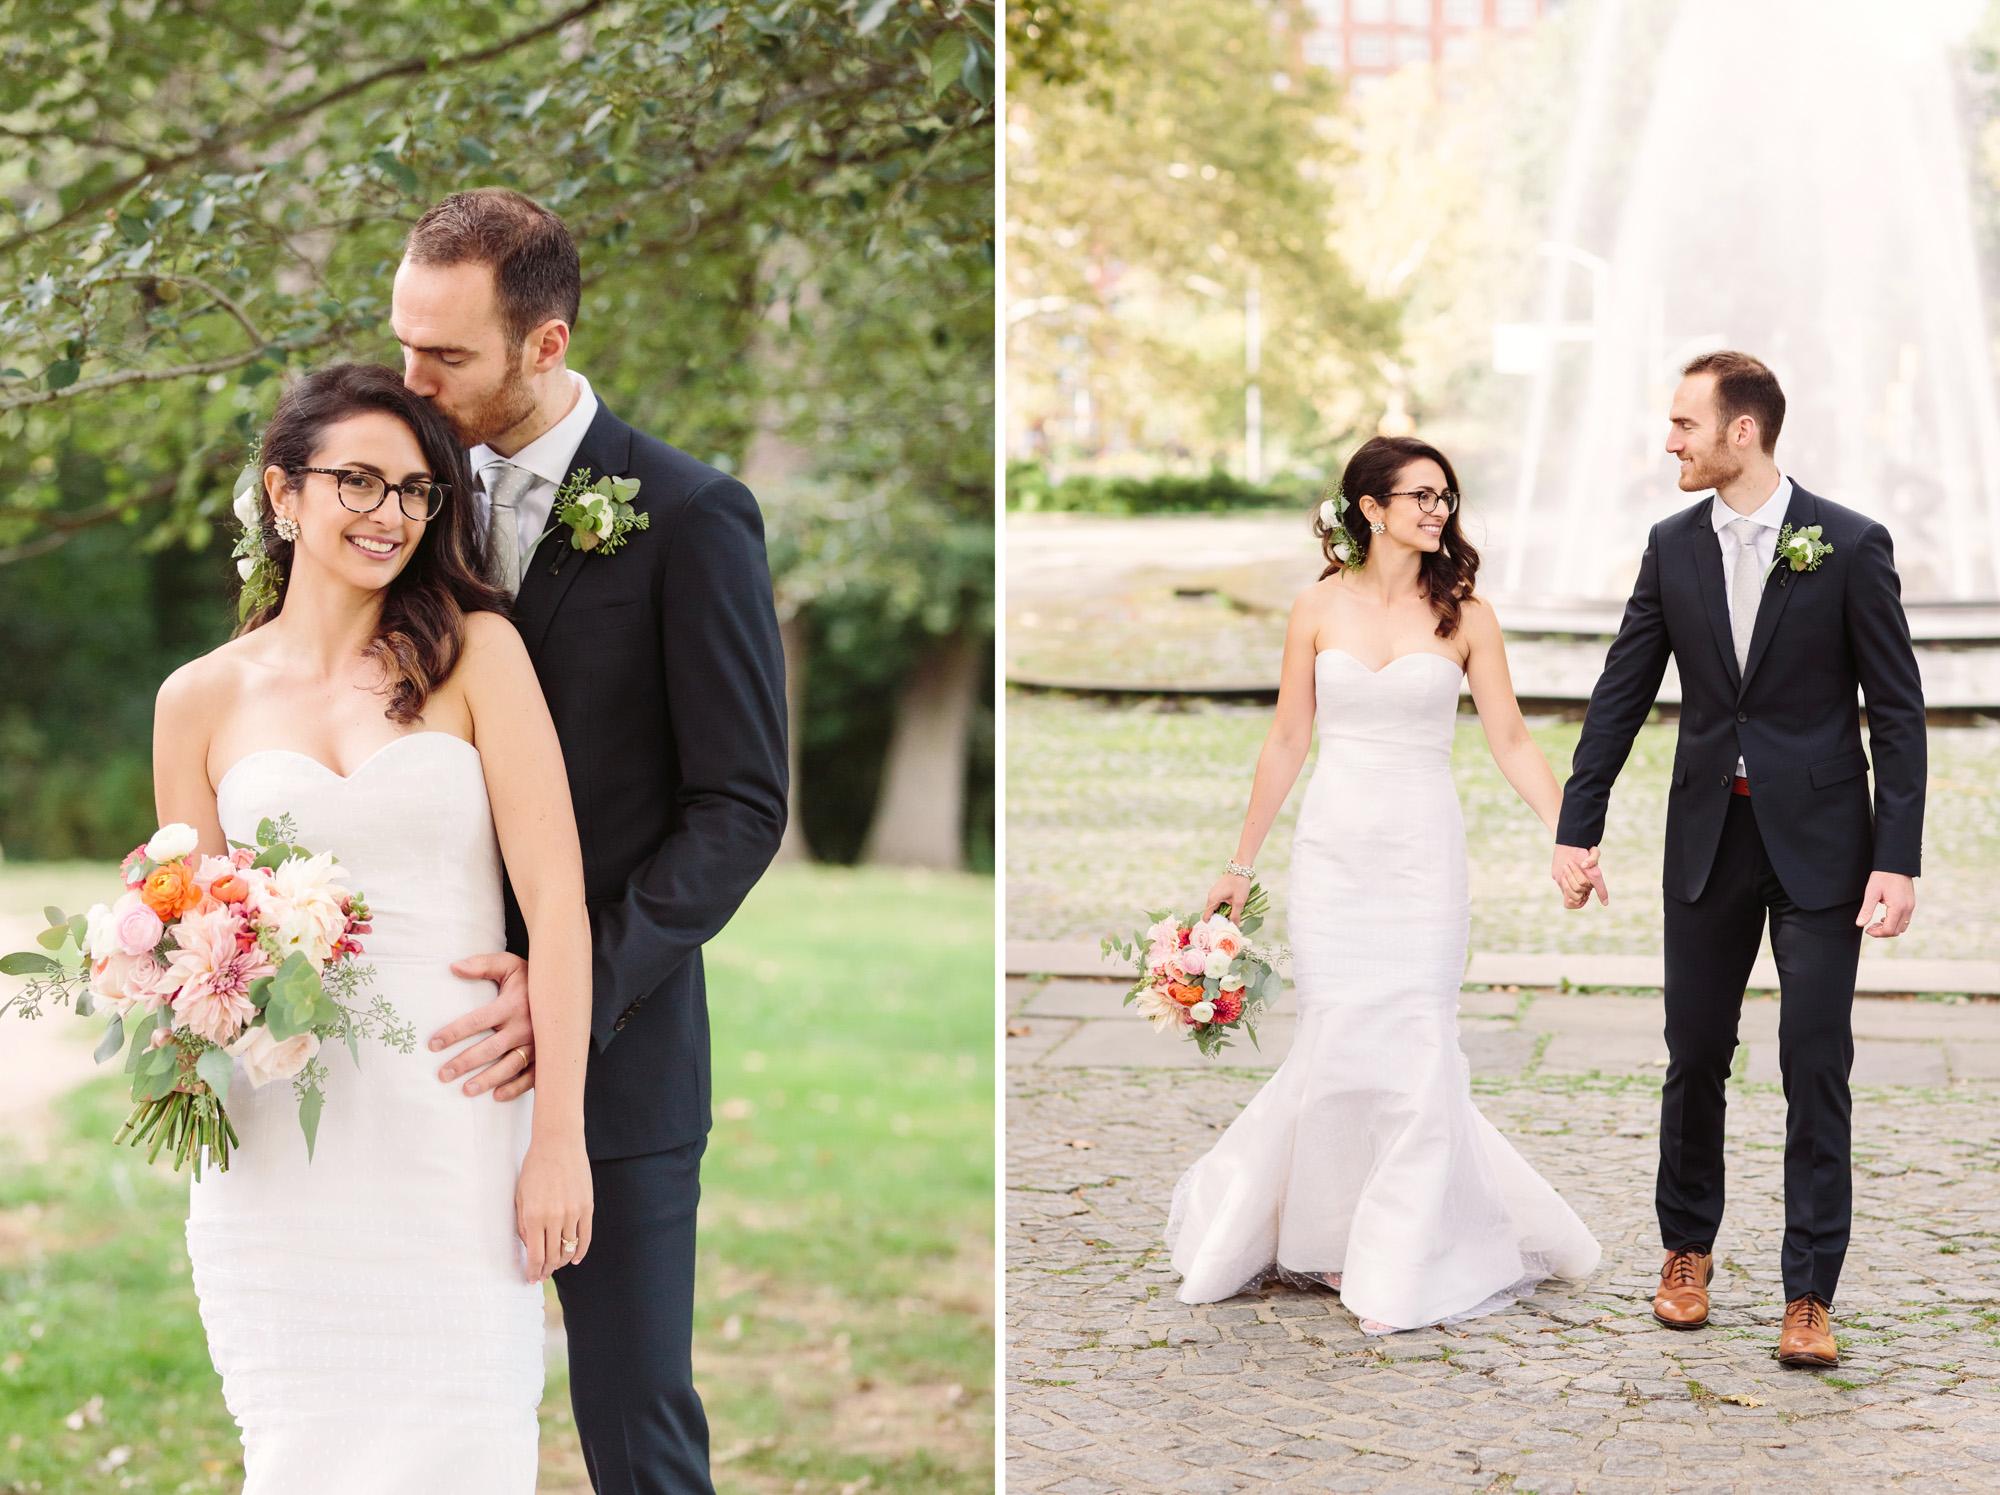 02_Kate_Sam_Picnic_House_Wedding_Brooklyn_NY_Tanya_Salazar_Photography.jpg